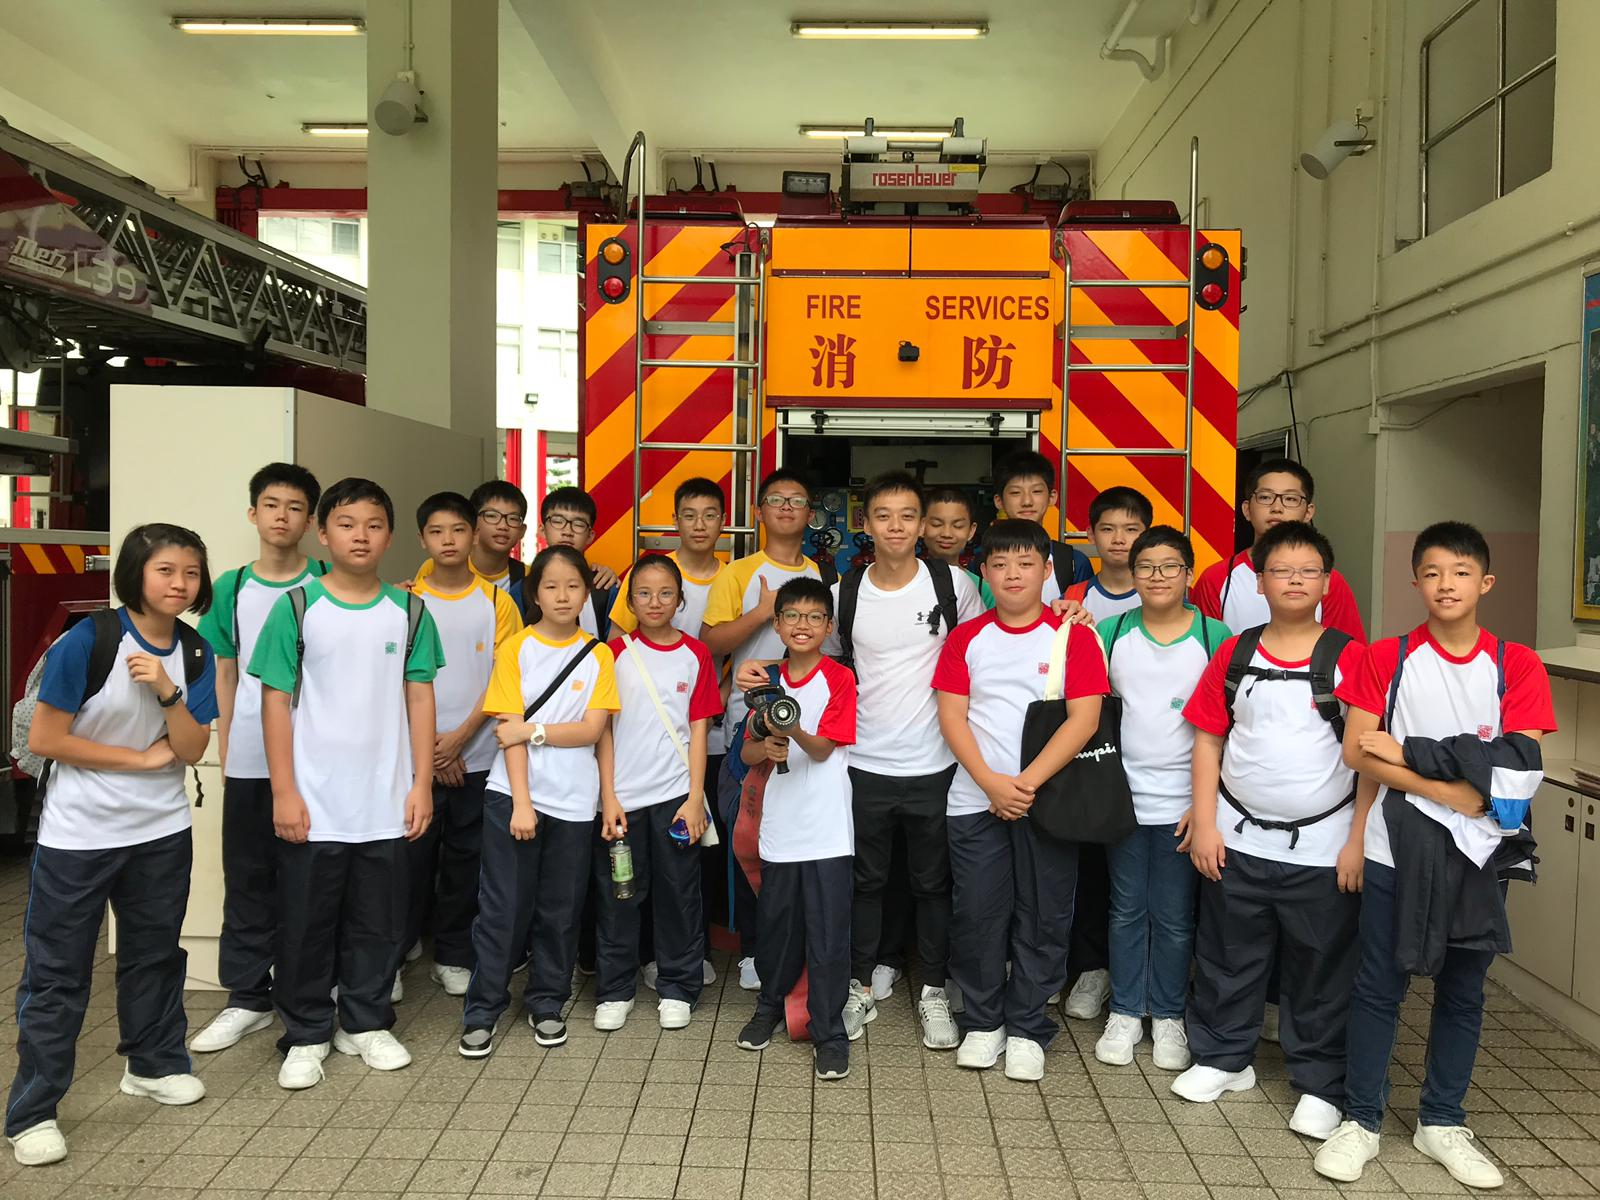 https://npc.edu.hk/sites/default/files/img-20190716-wa0010.jpg